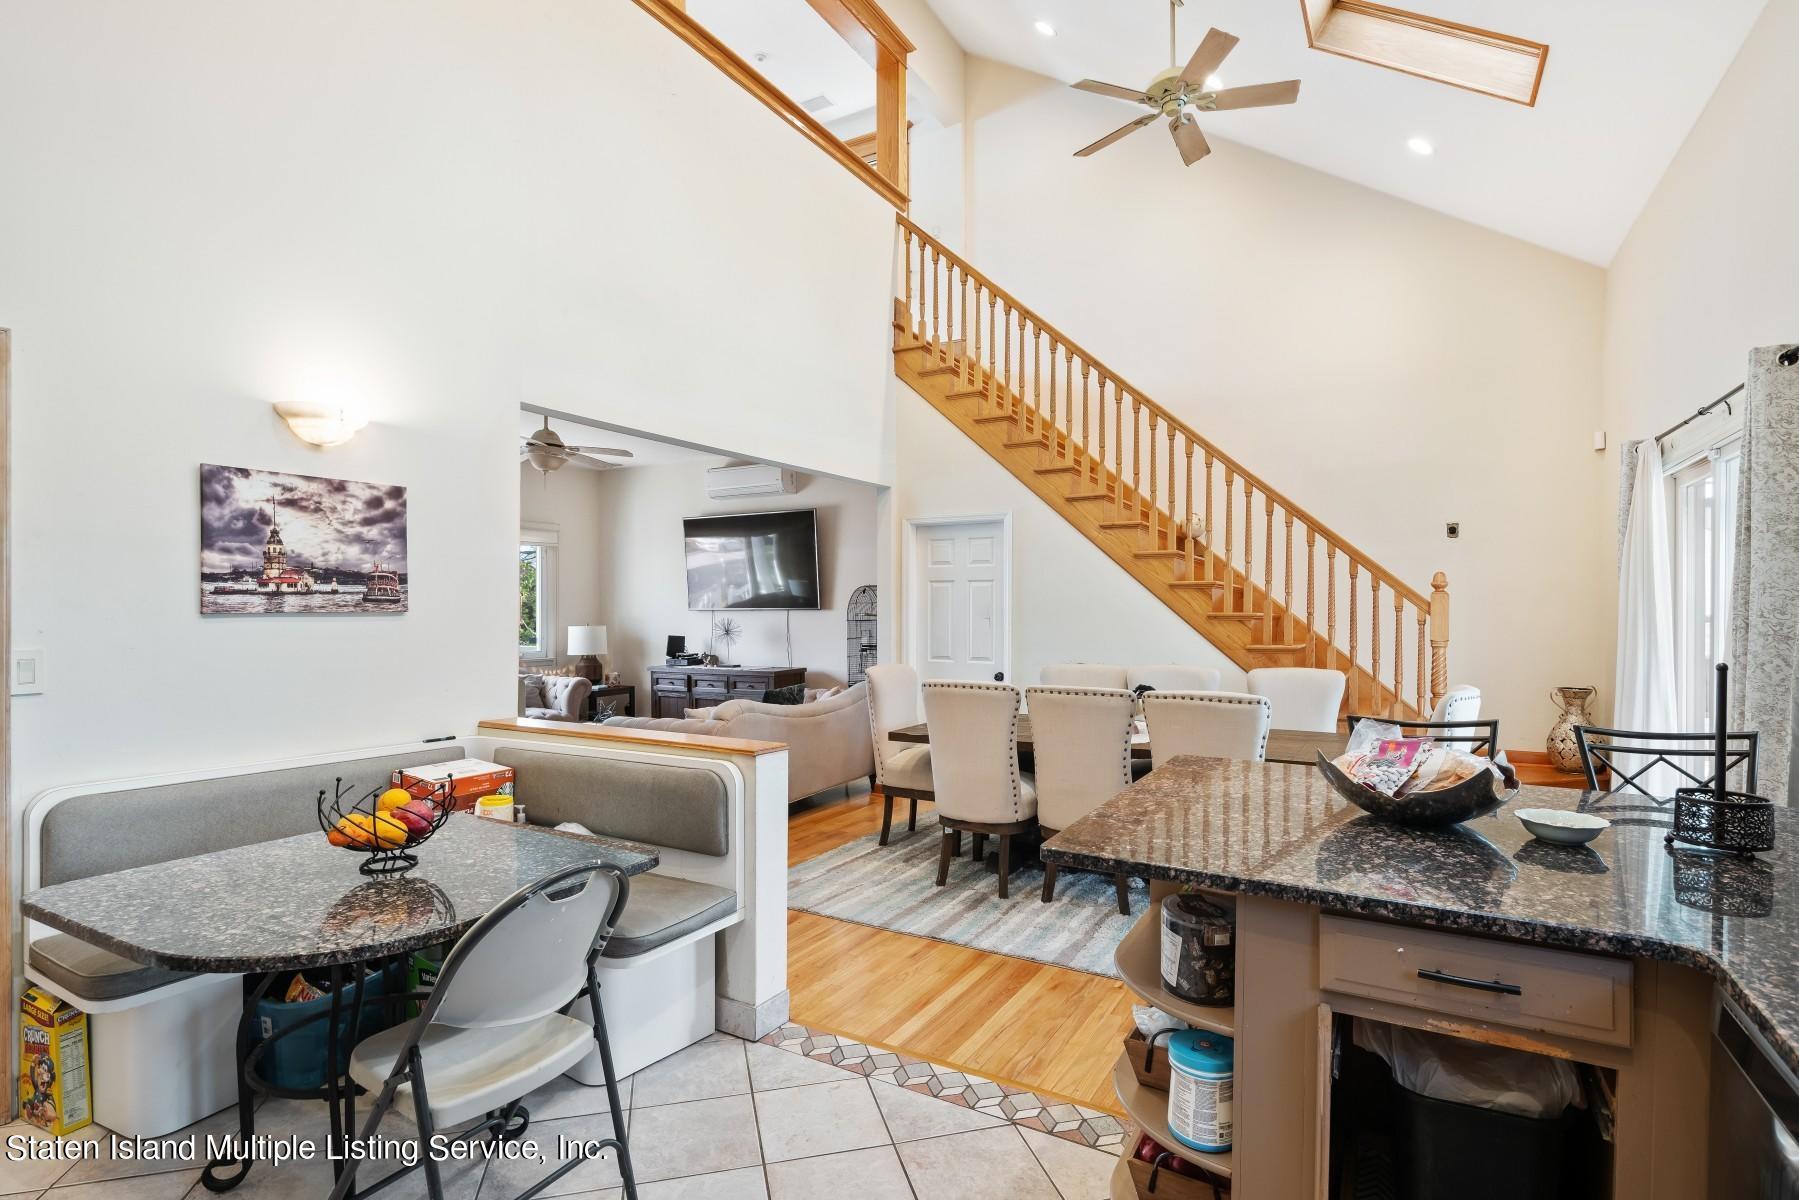 Single Family - Detached 8 Bionia Avenue  Staten Island, NY 10305, MLS-1142818-3